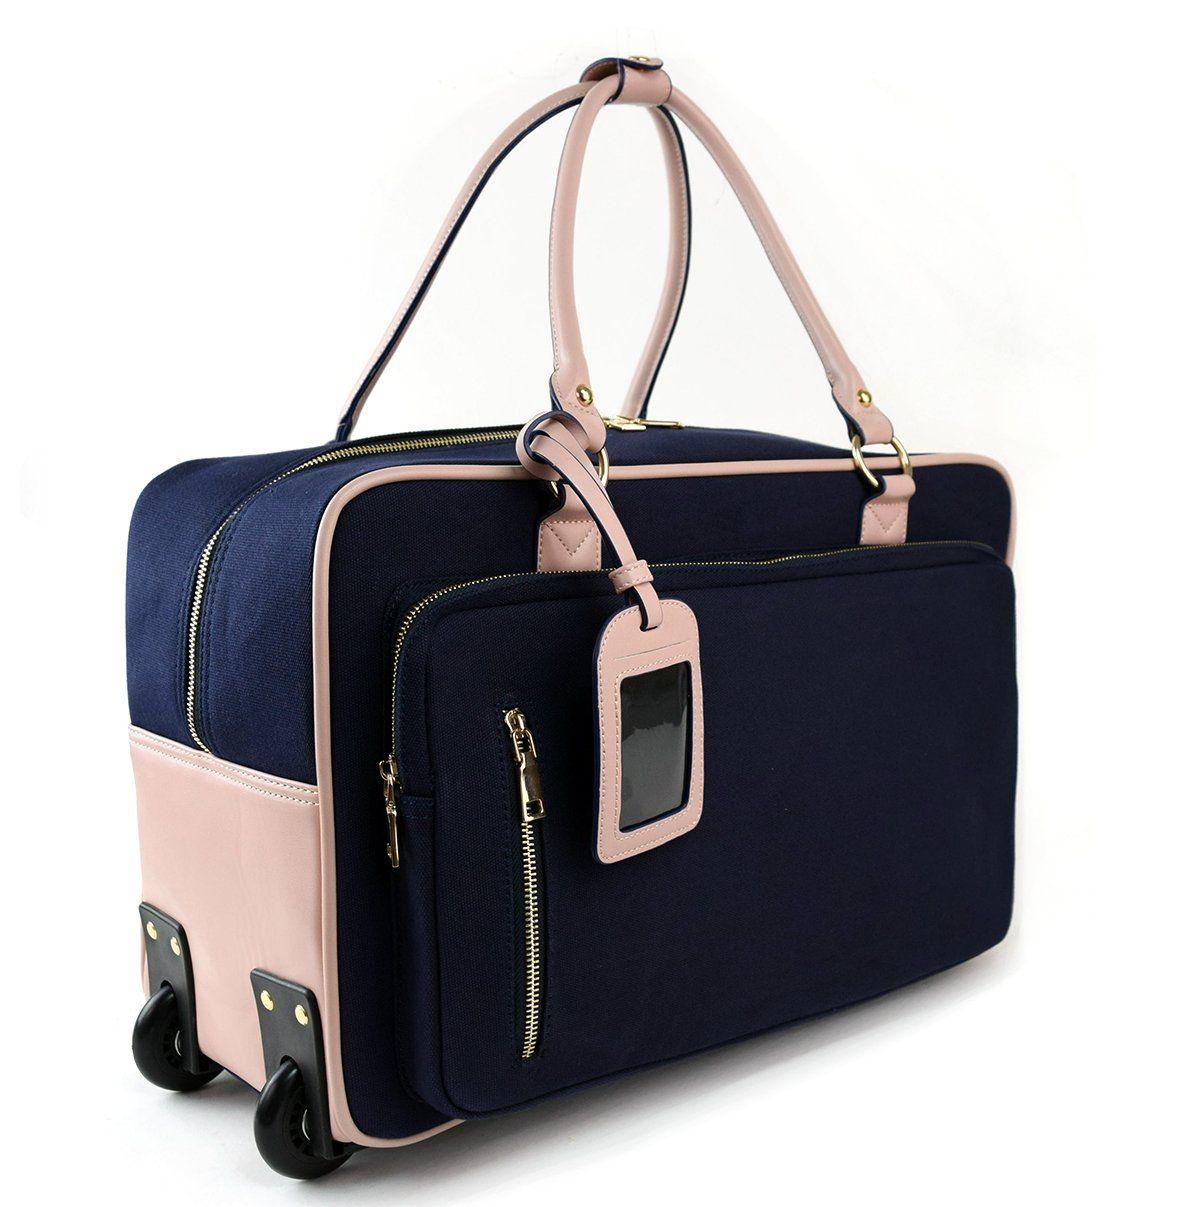 Womens Travel Duffel Overnight Carry On Weekend Bag w Wheels ...